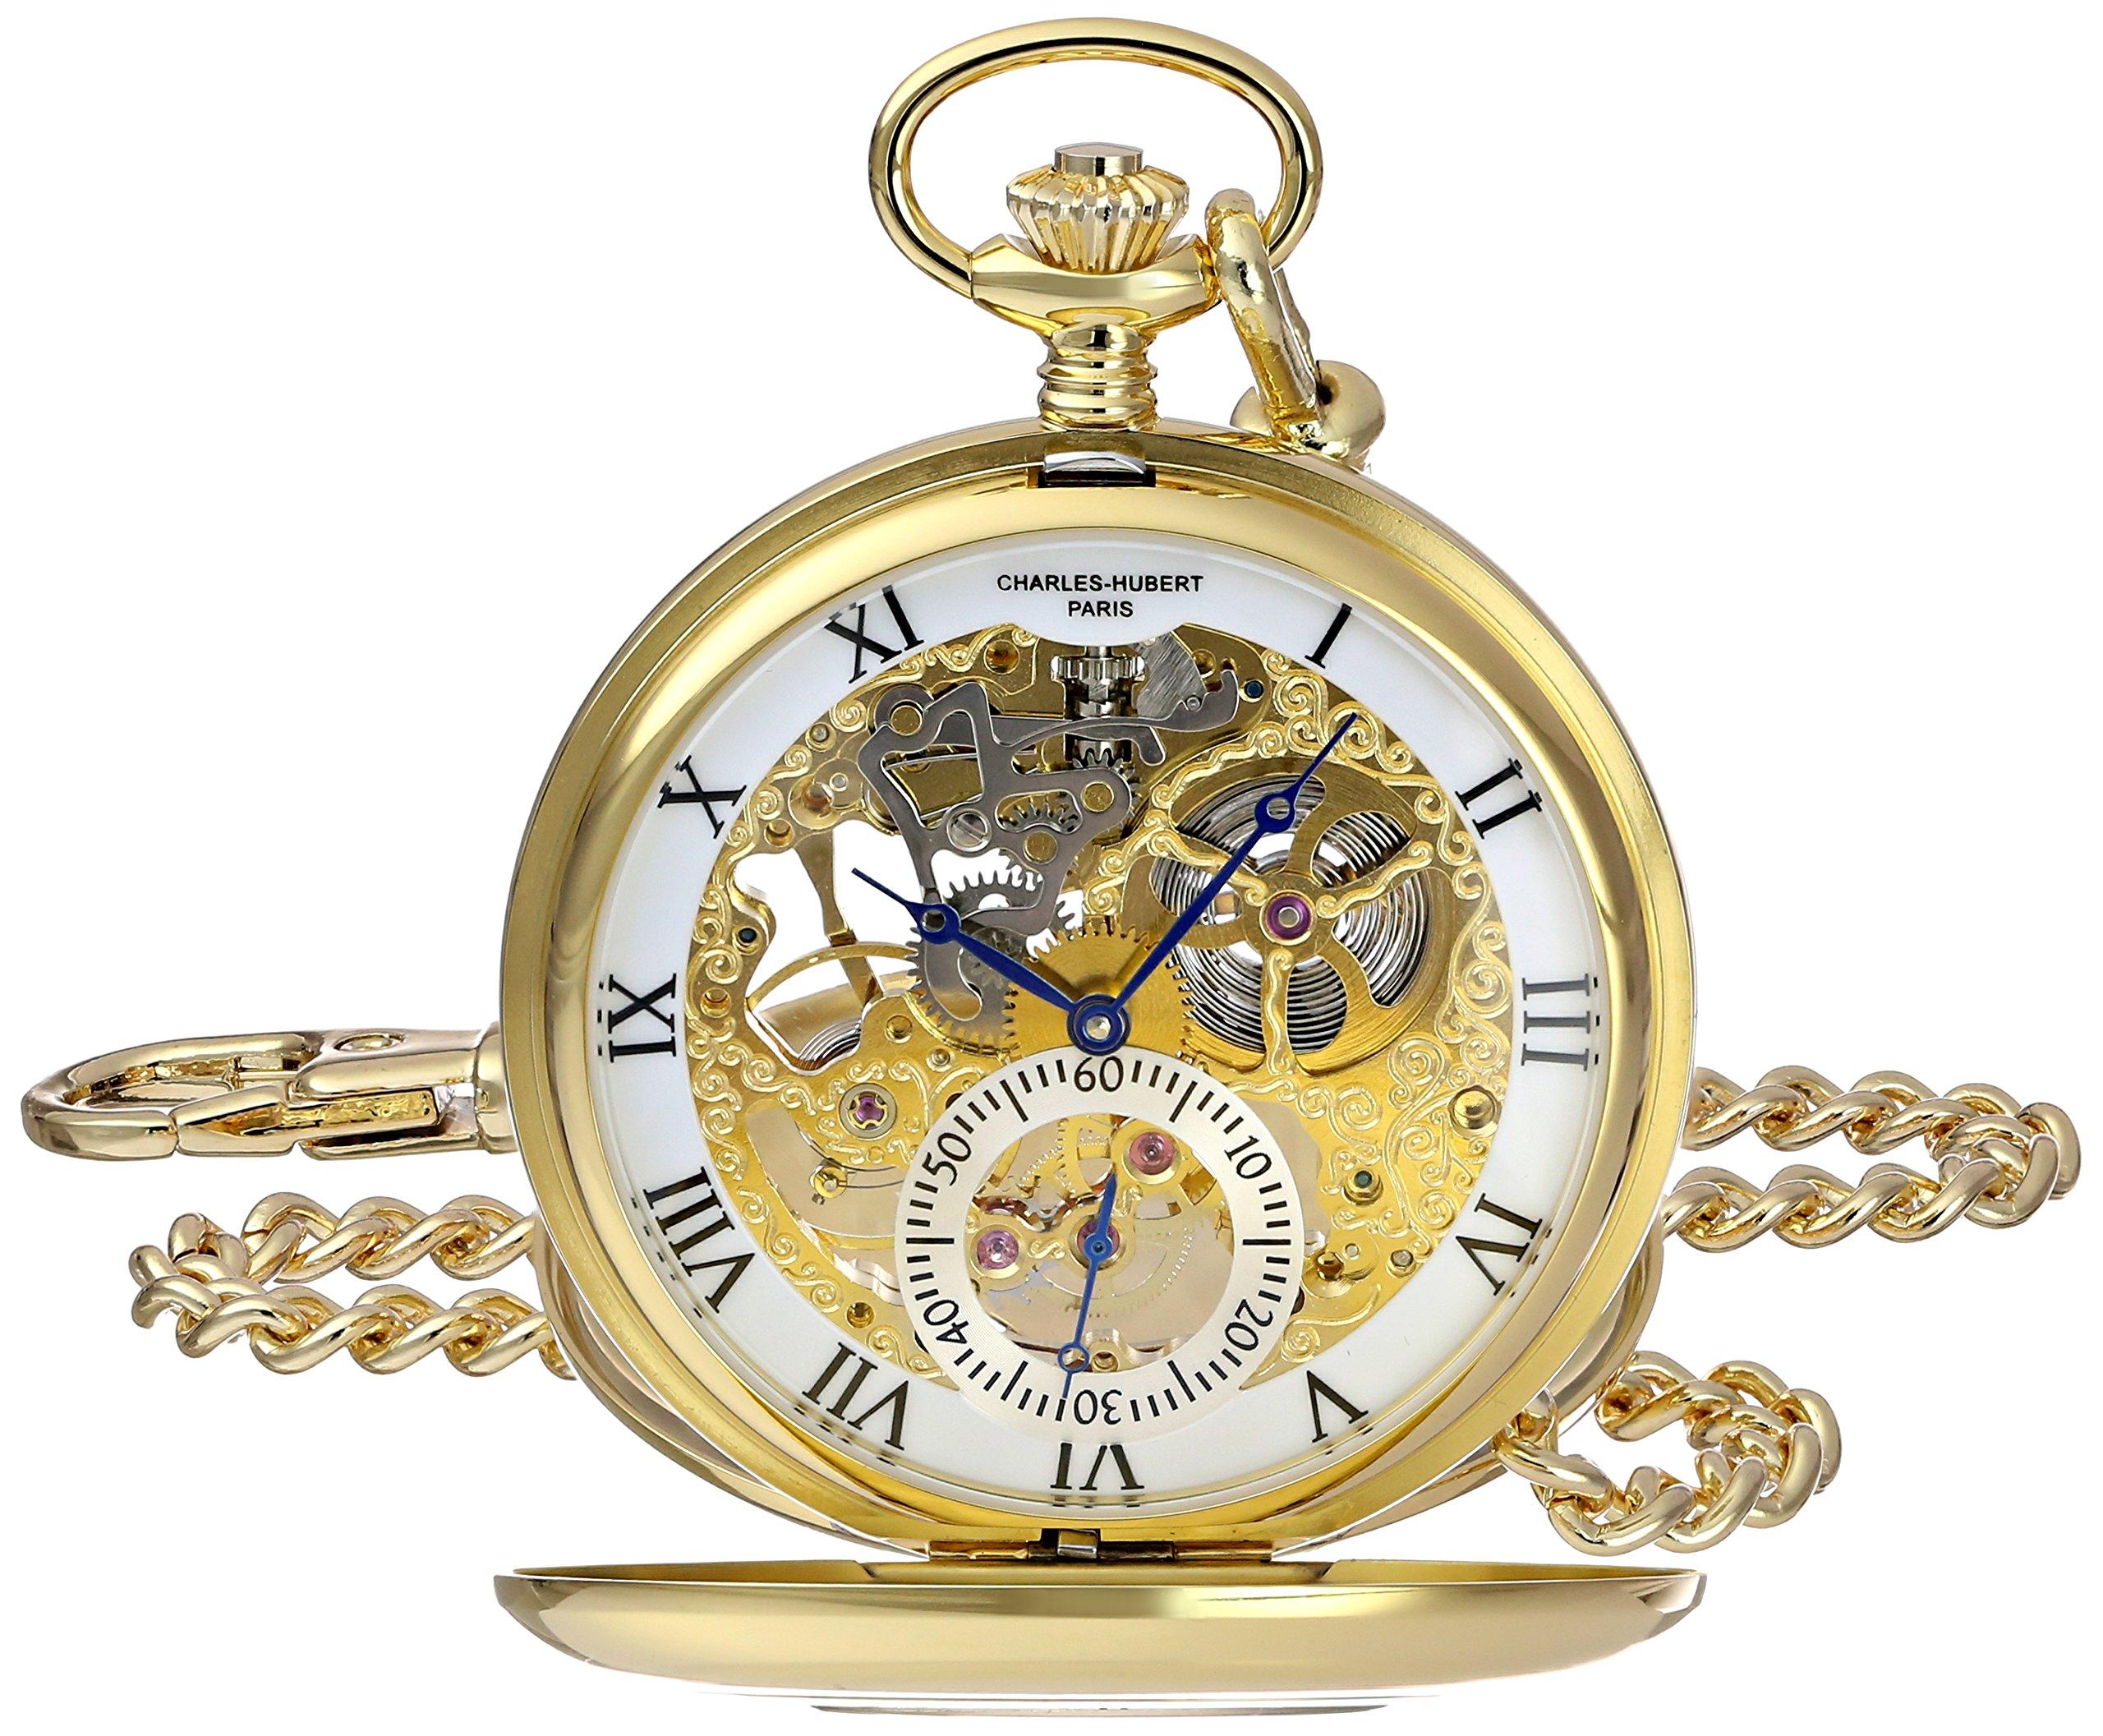 Charles-Hubert, Paris 3972-G Premium Collection Analog Display Mechanical Hand Wind Pocket Watch